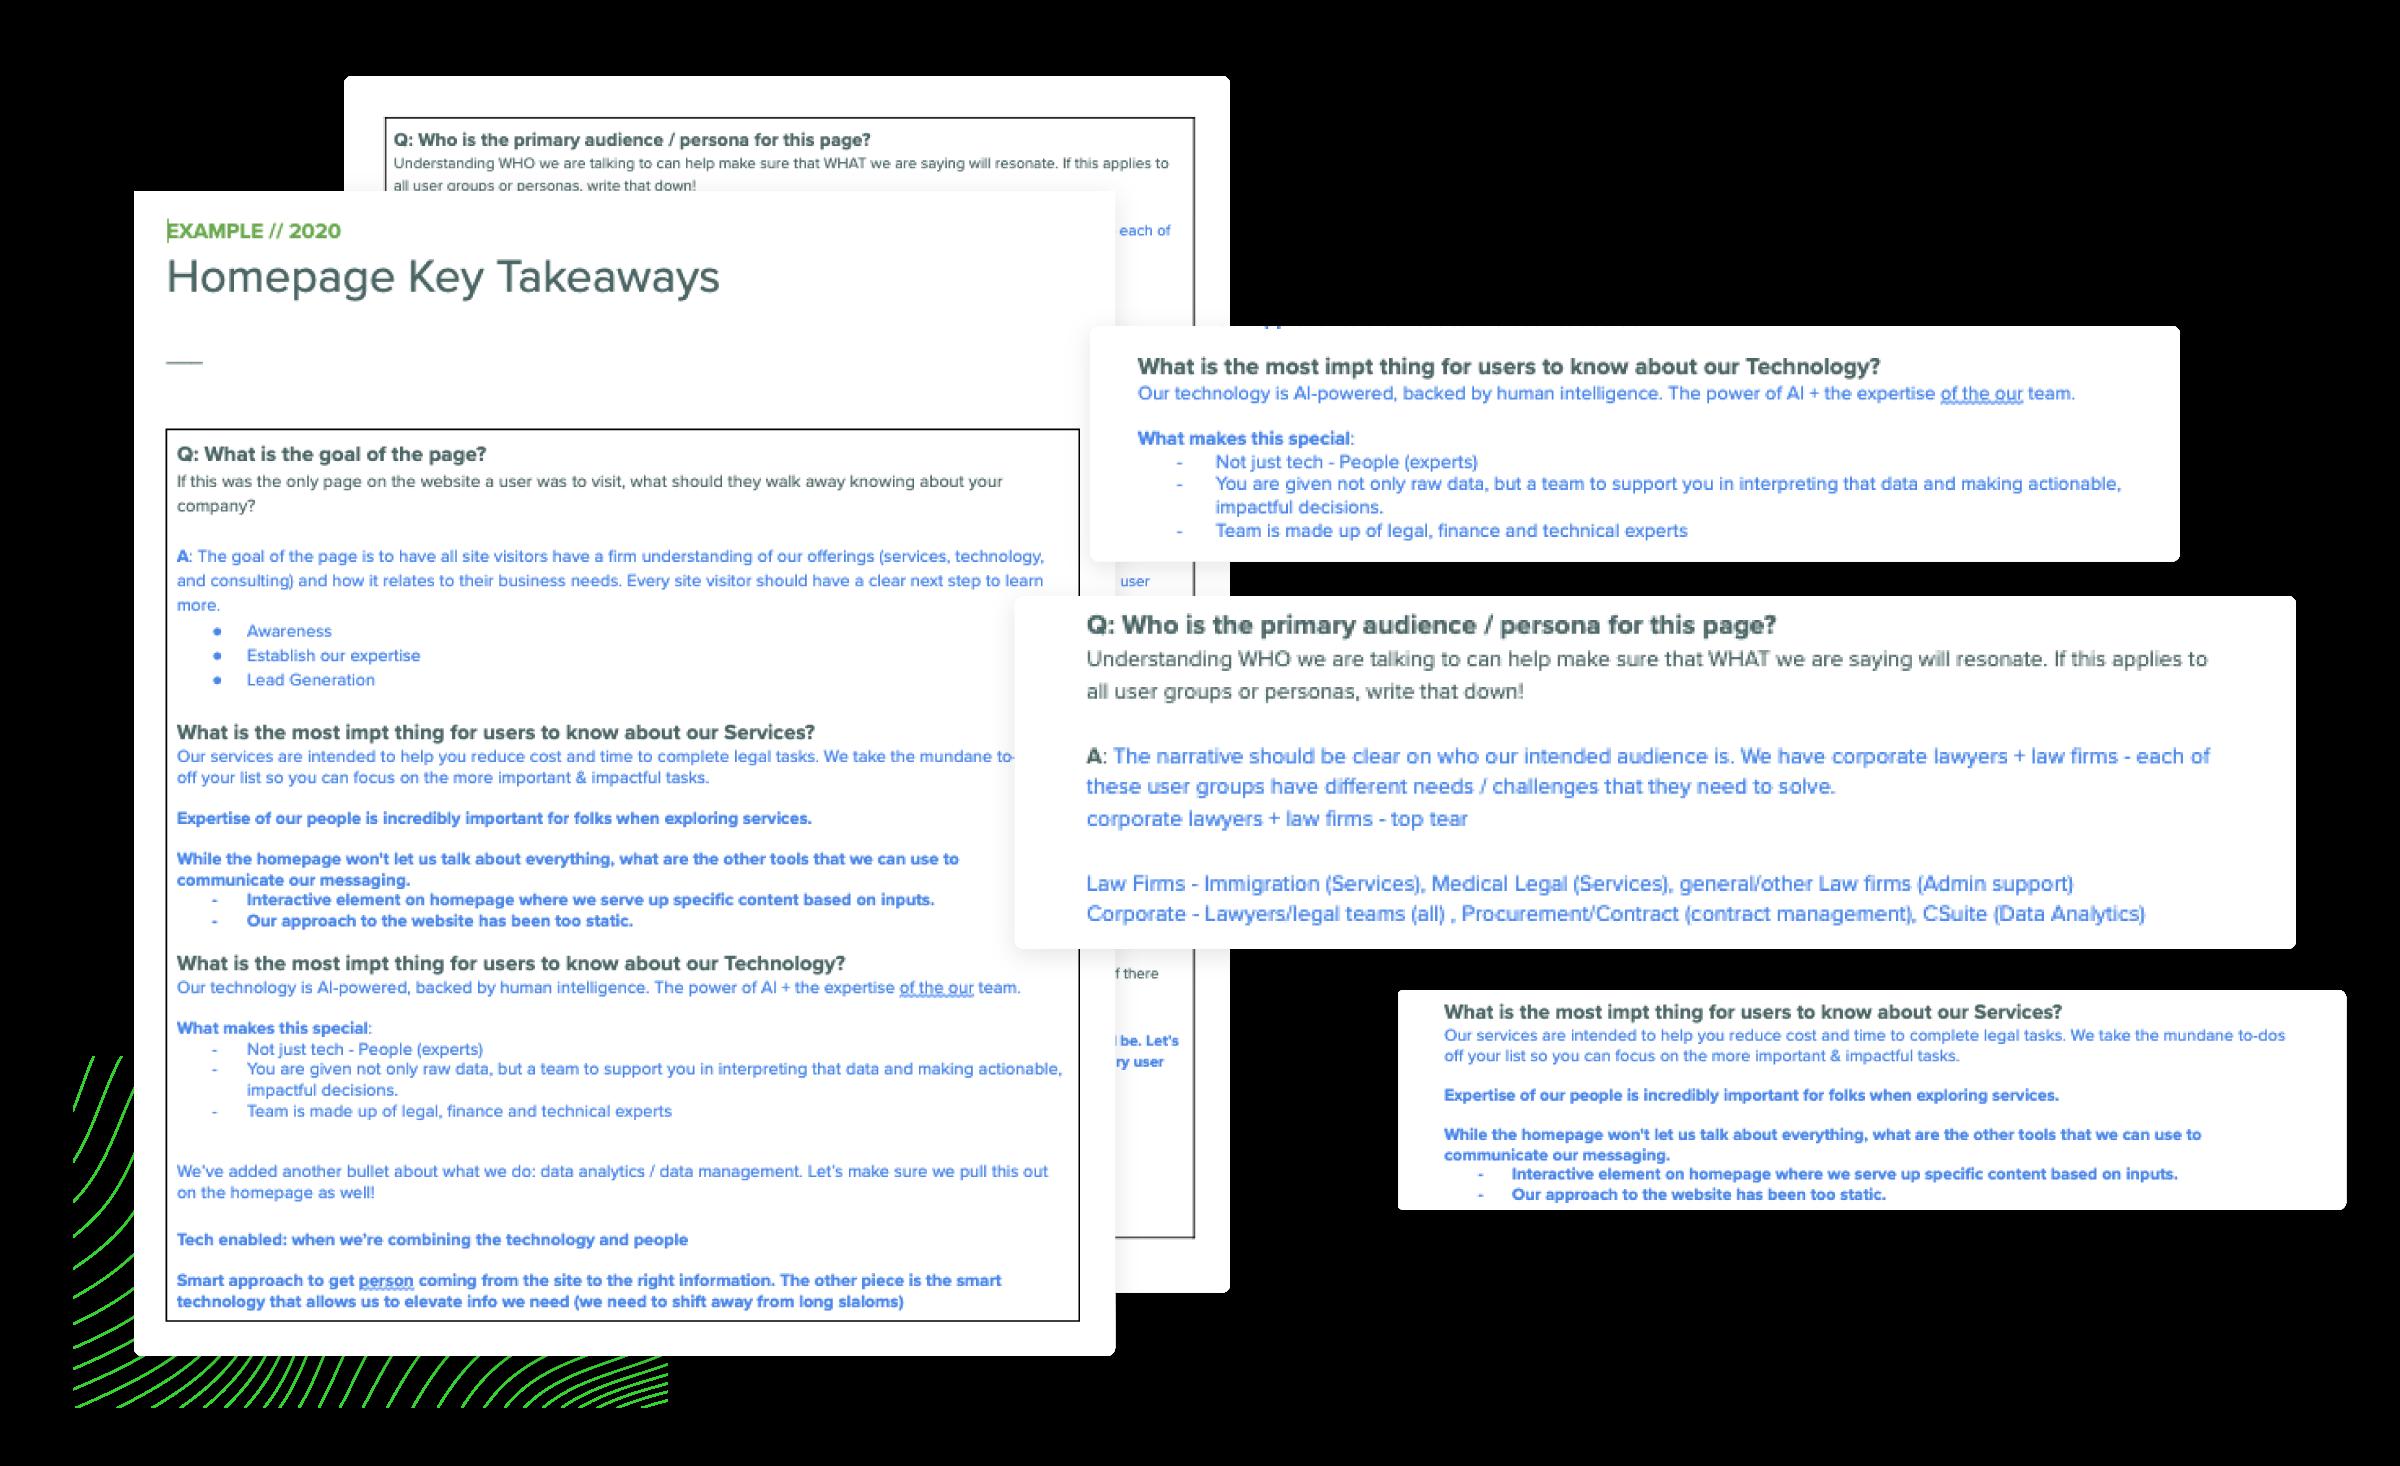 21-02-SRW client involvement-Key takeaways